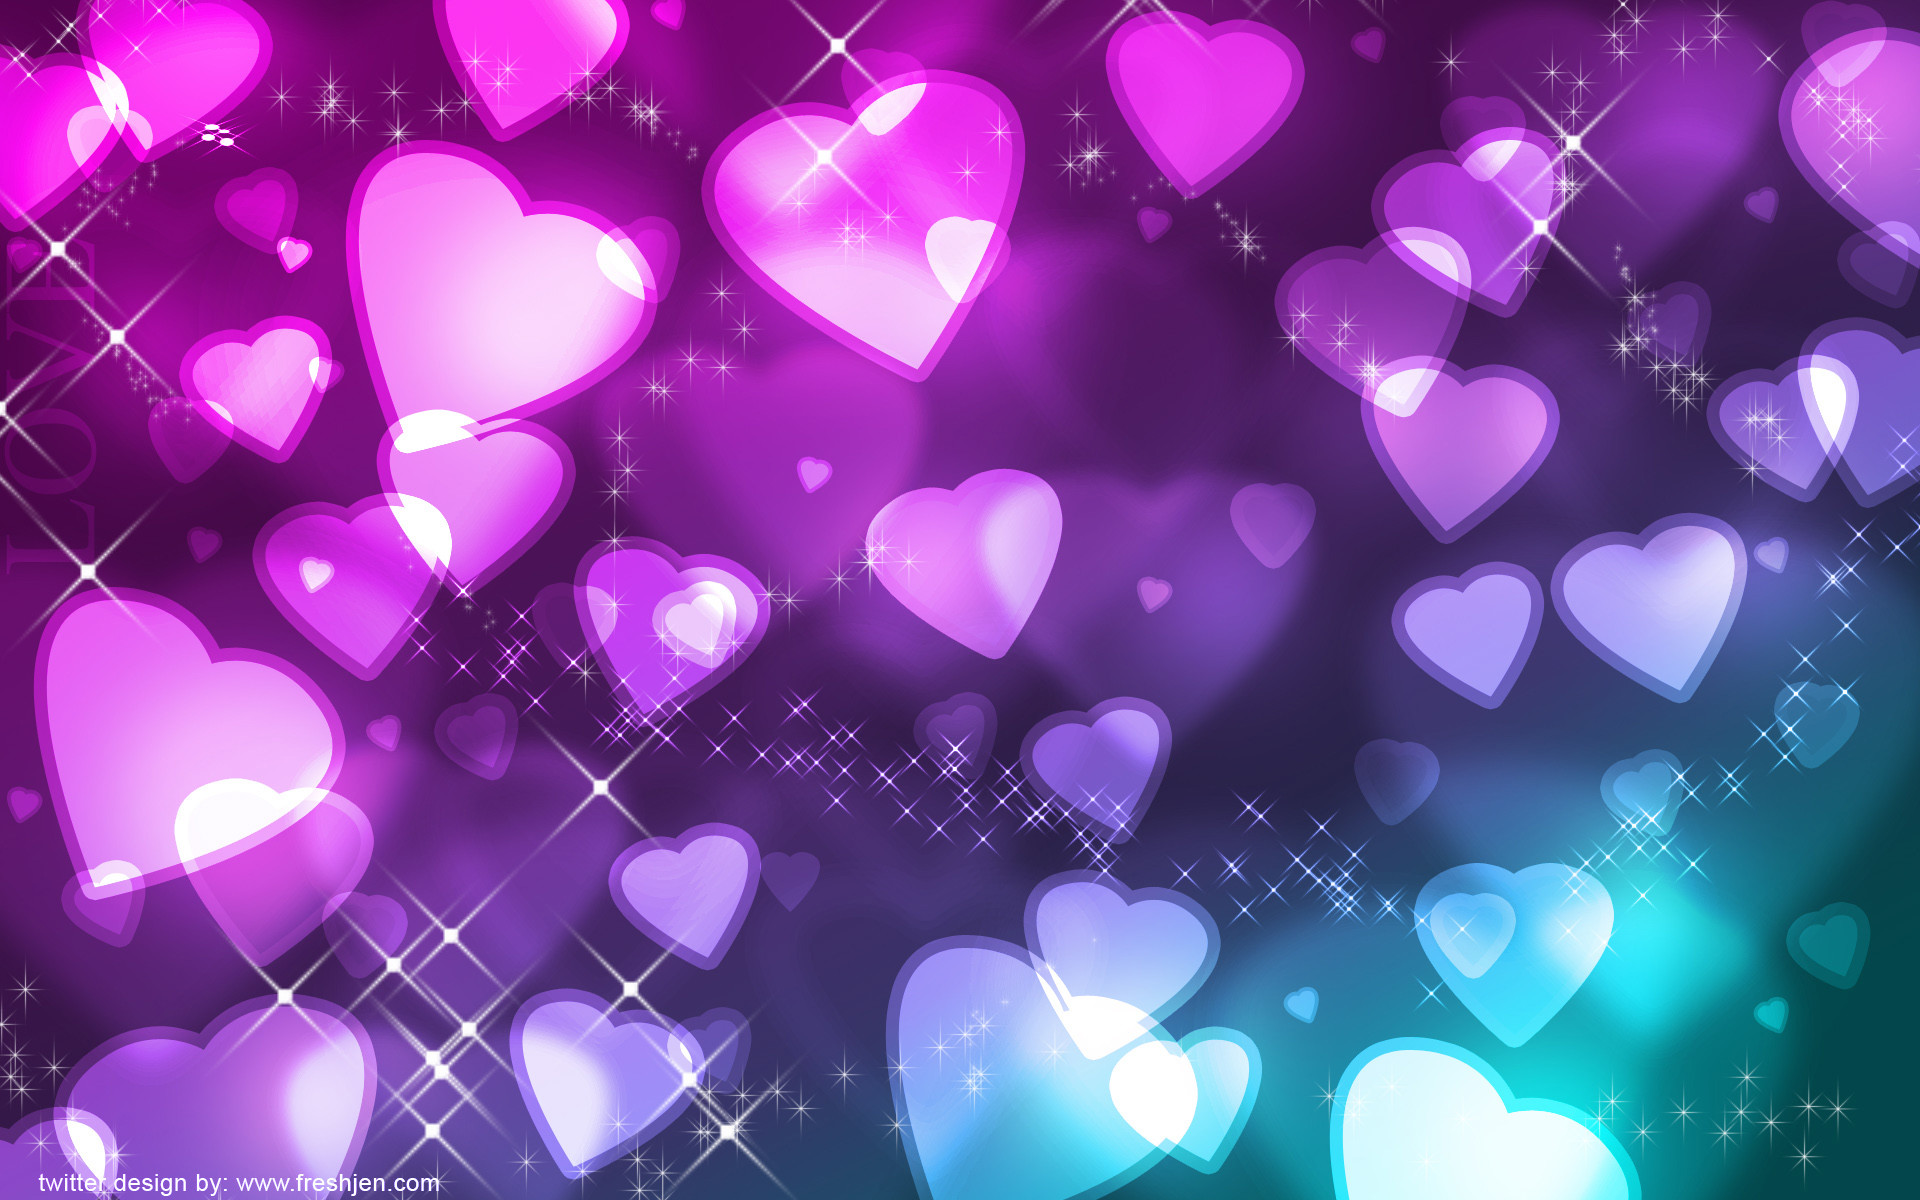 heart wallpaper,purple,violet,heart,light,pink